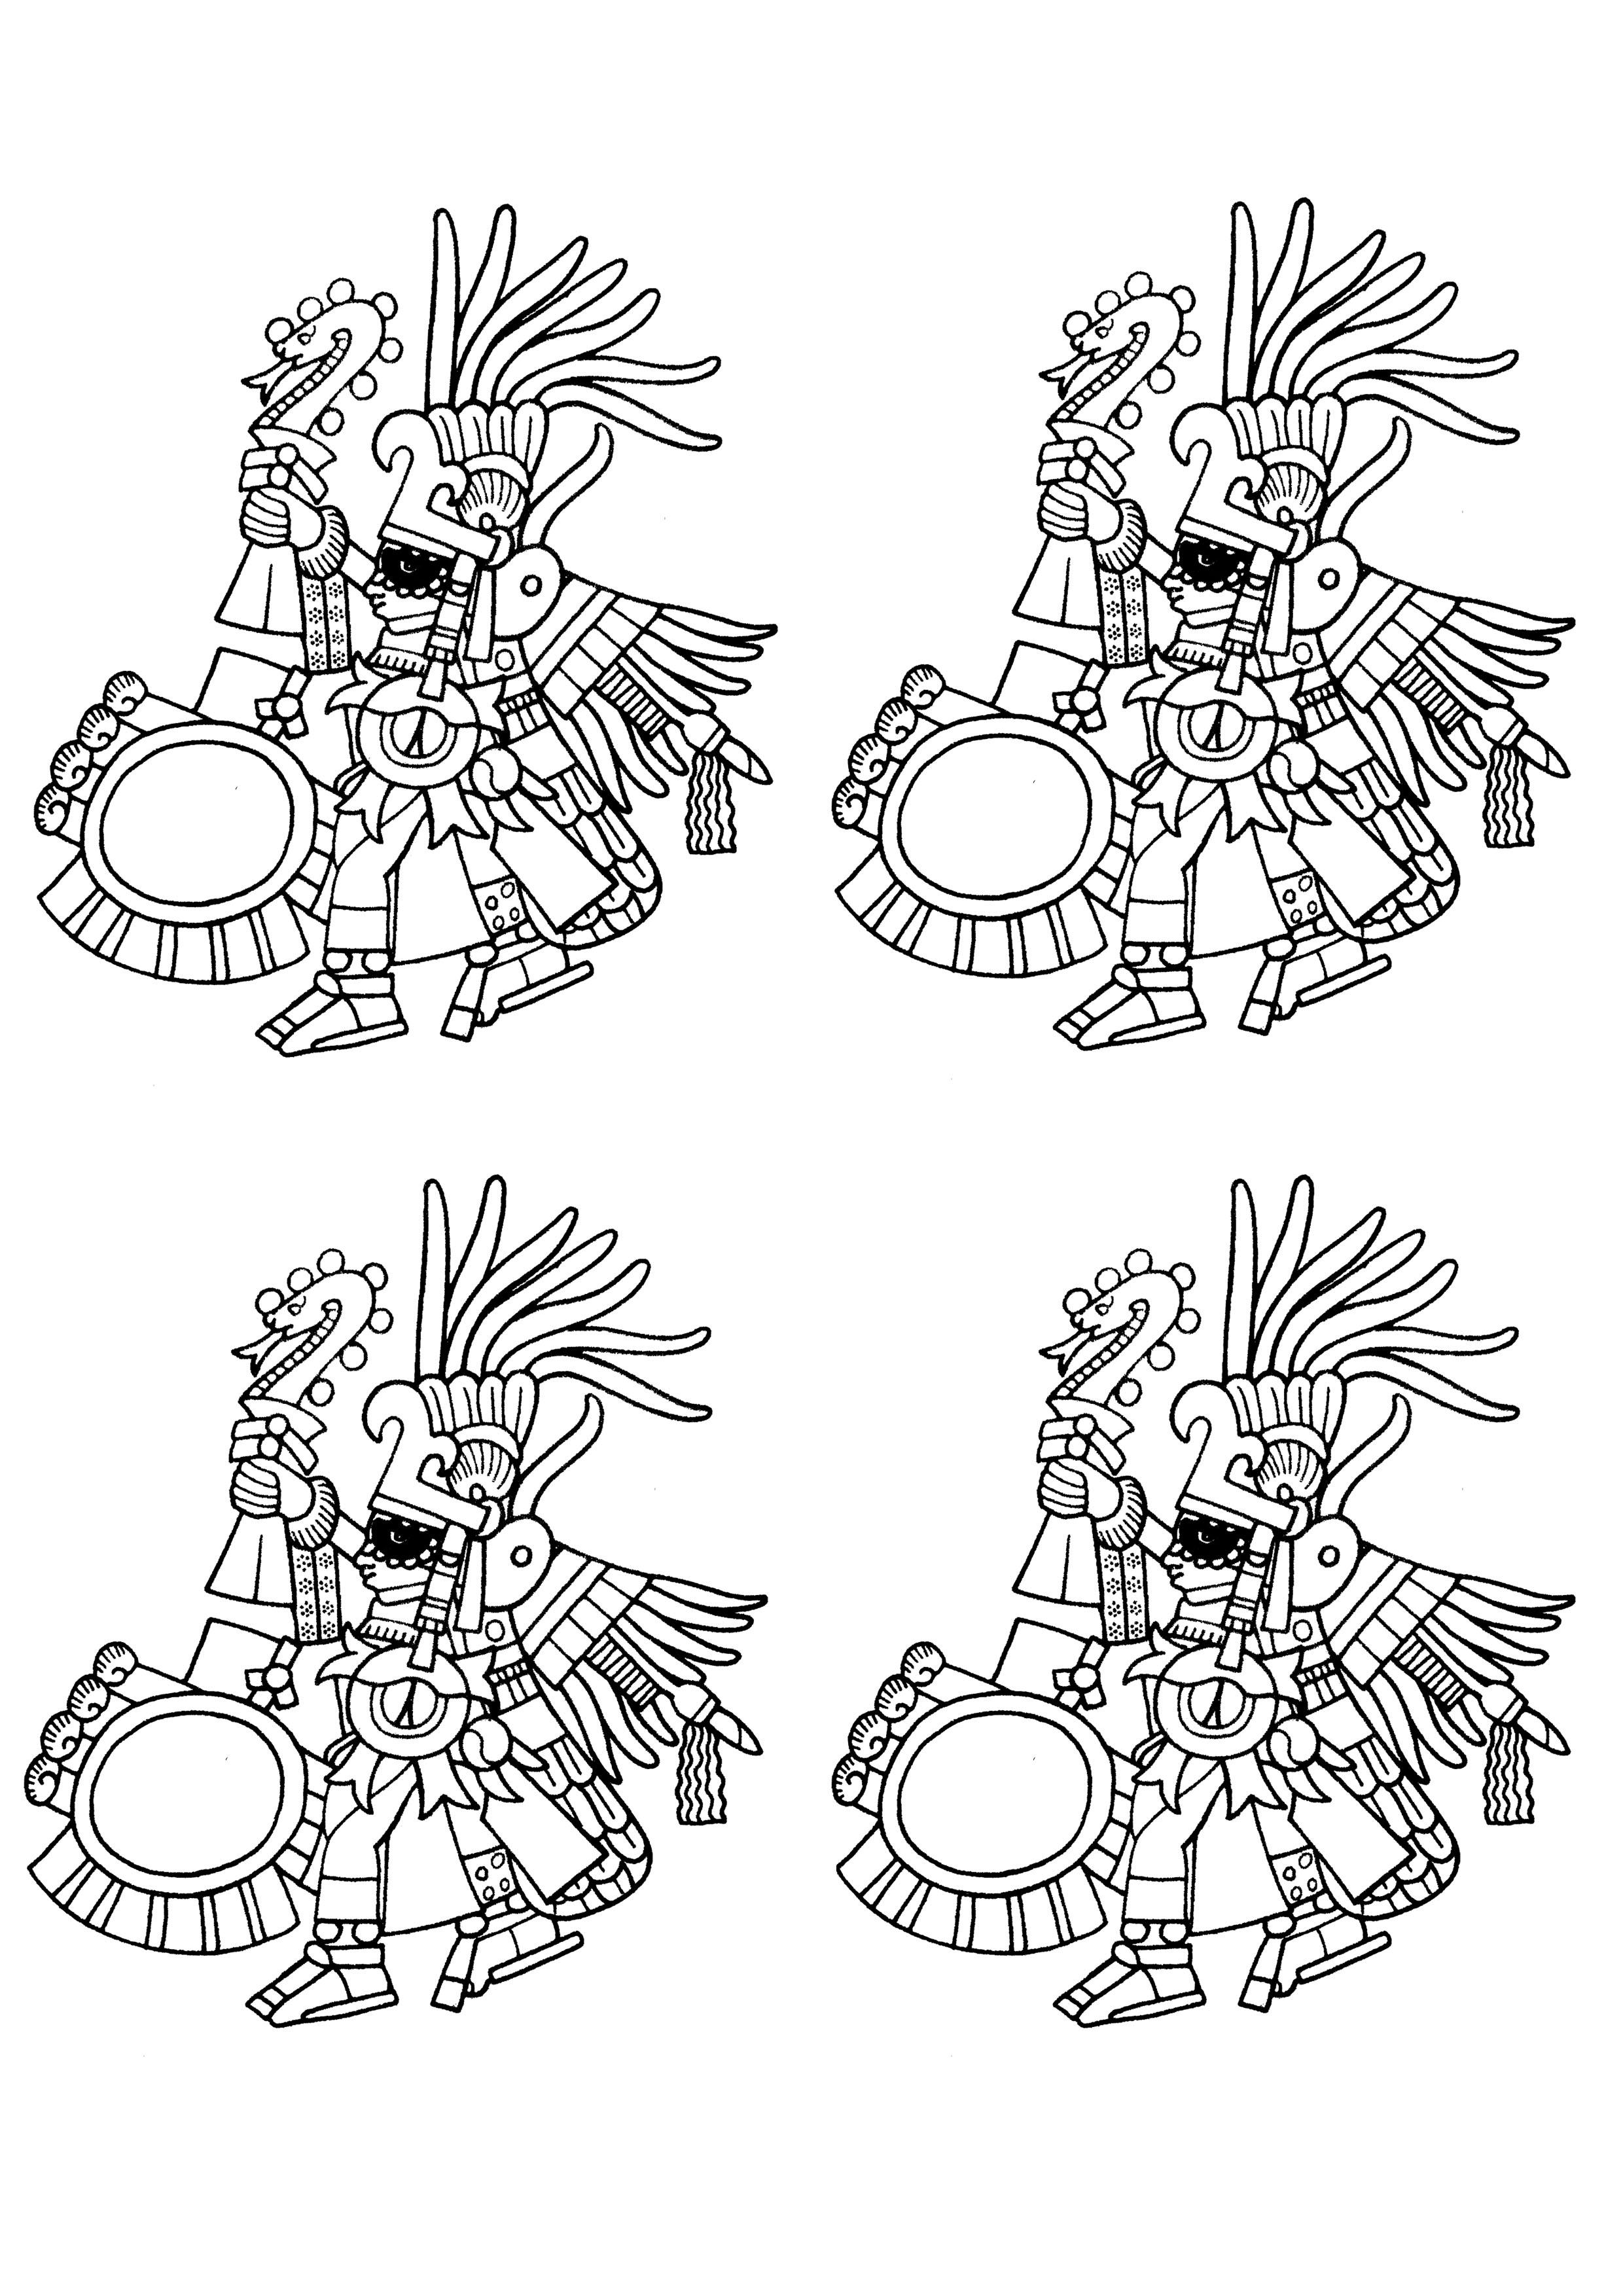 Huitzilopochtli, Dieu Aztèque de la Guerre, brandissant un bâton à l'effigie de Xiuhcoatl le 'serpent de feu'. Version avec quatre éléments.